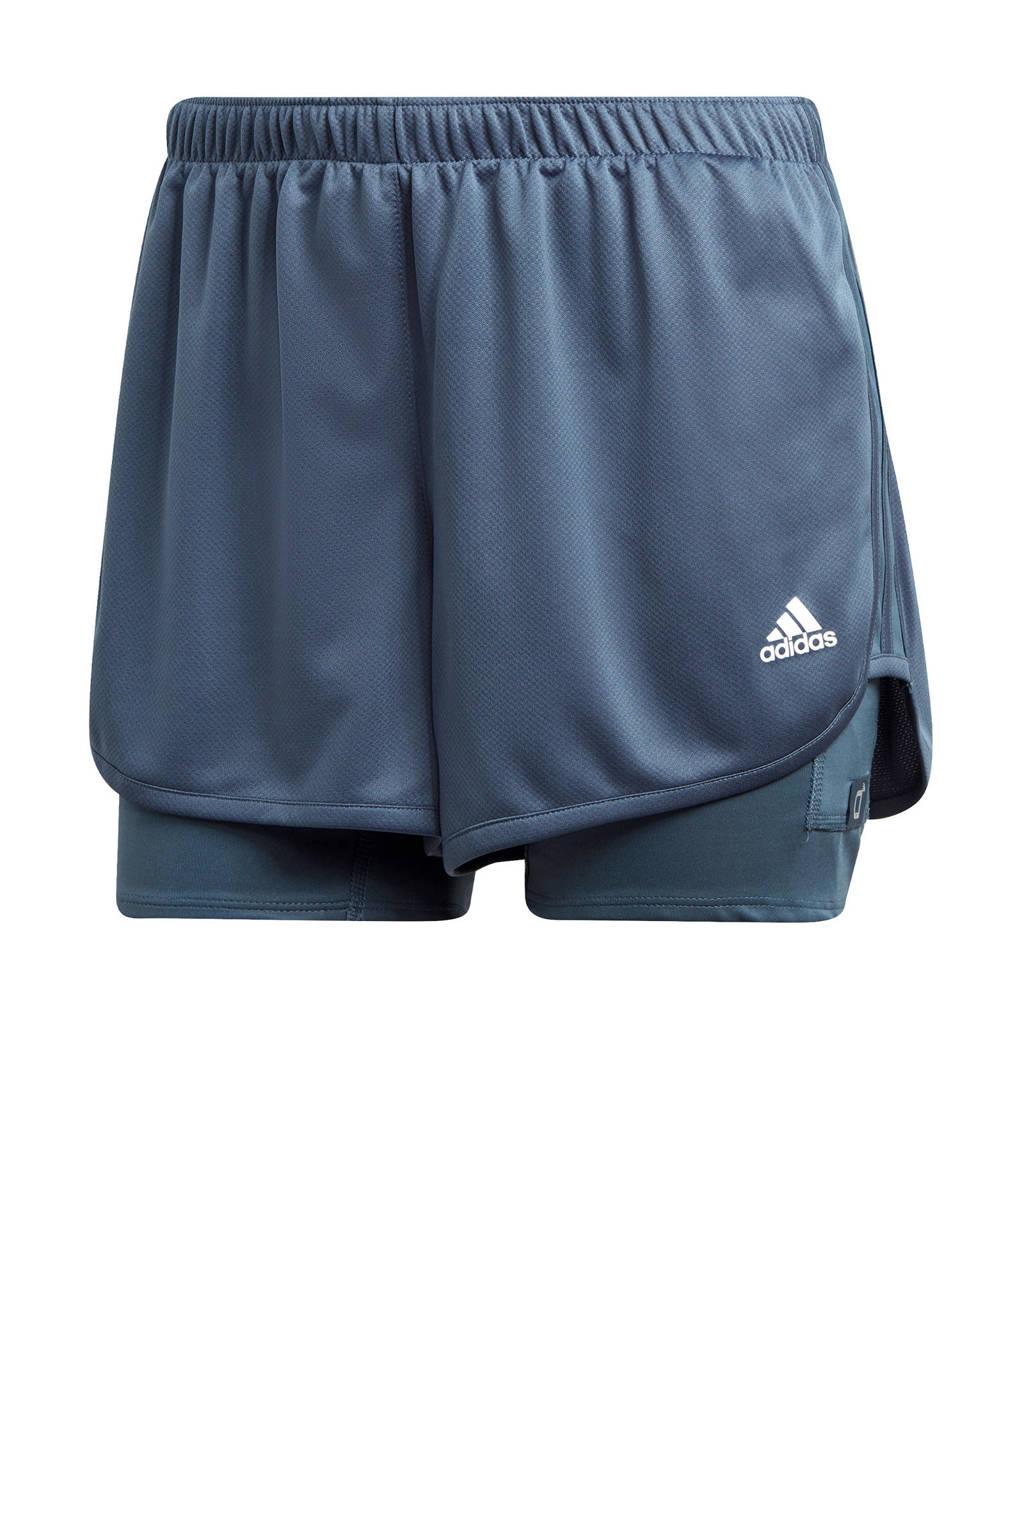 adidas Performance hardloopshort blauw, Blauw